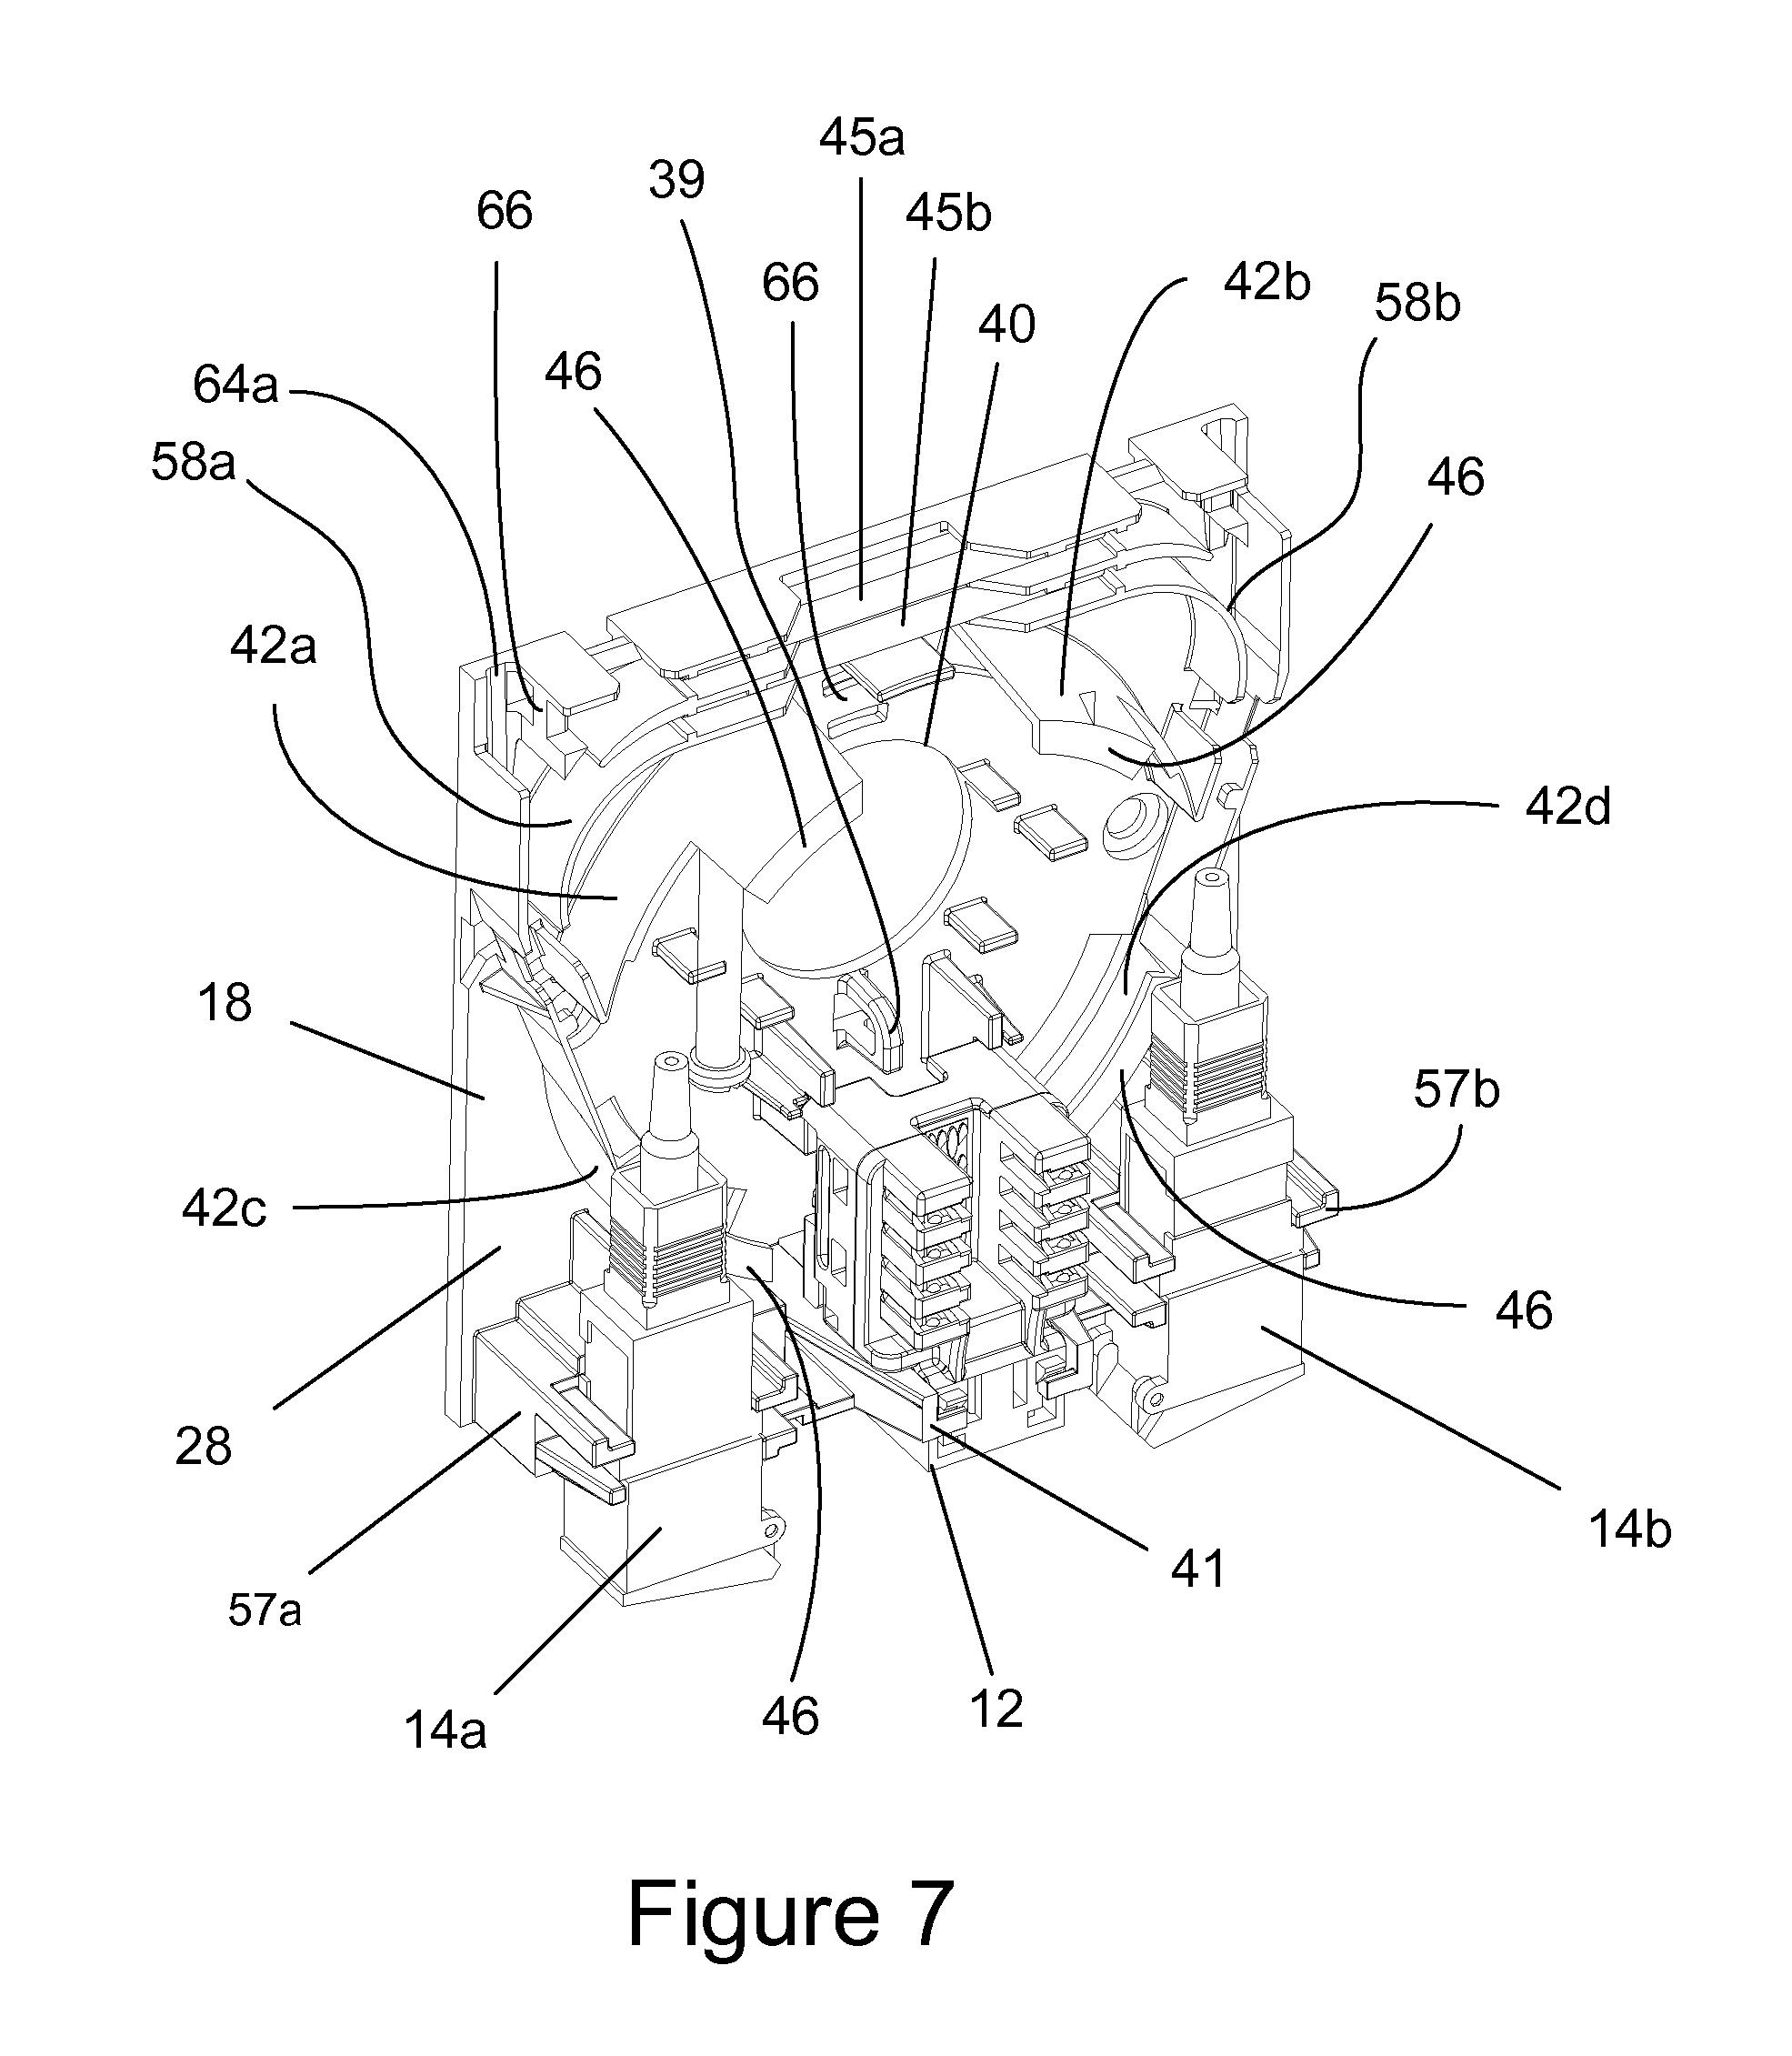 hight resolution of wiring diagram view diagram wiring diagram rj45 wall socket wiring socket outlet google on australian telephone